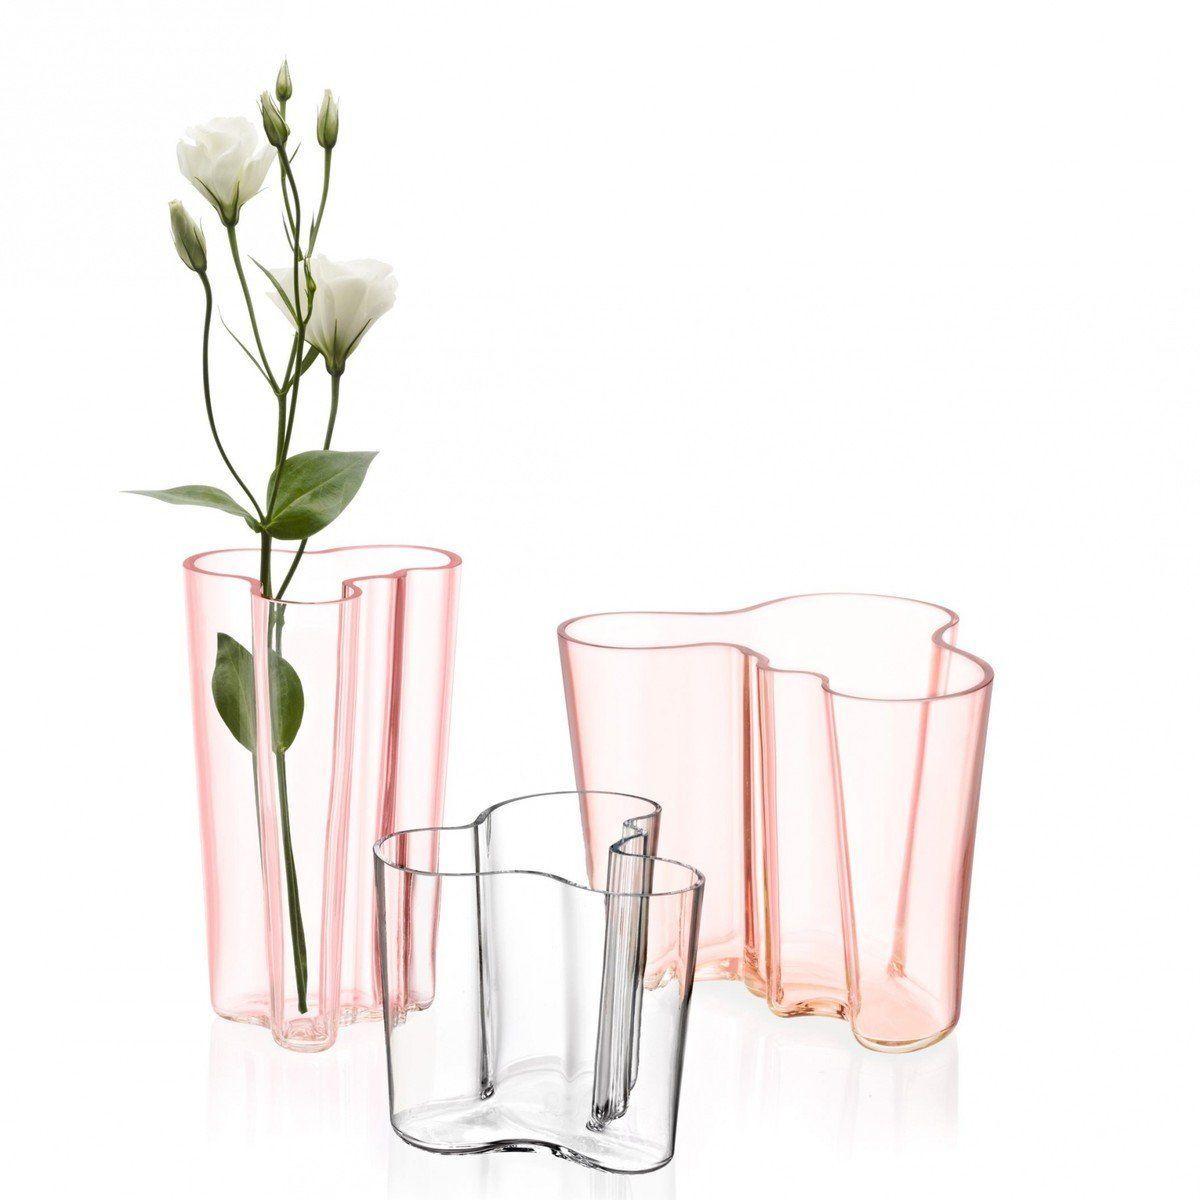 Alvar aalto vase 95mm iittala ambientedirect iittala alvar aalto vase 95mm reviewsmspy